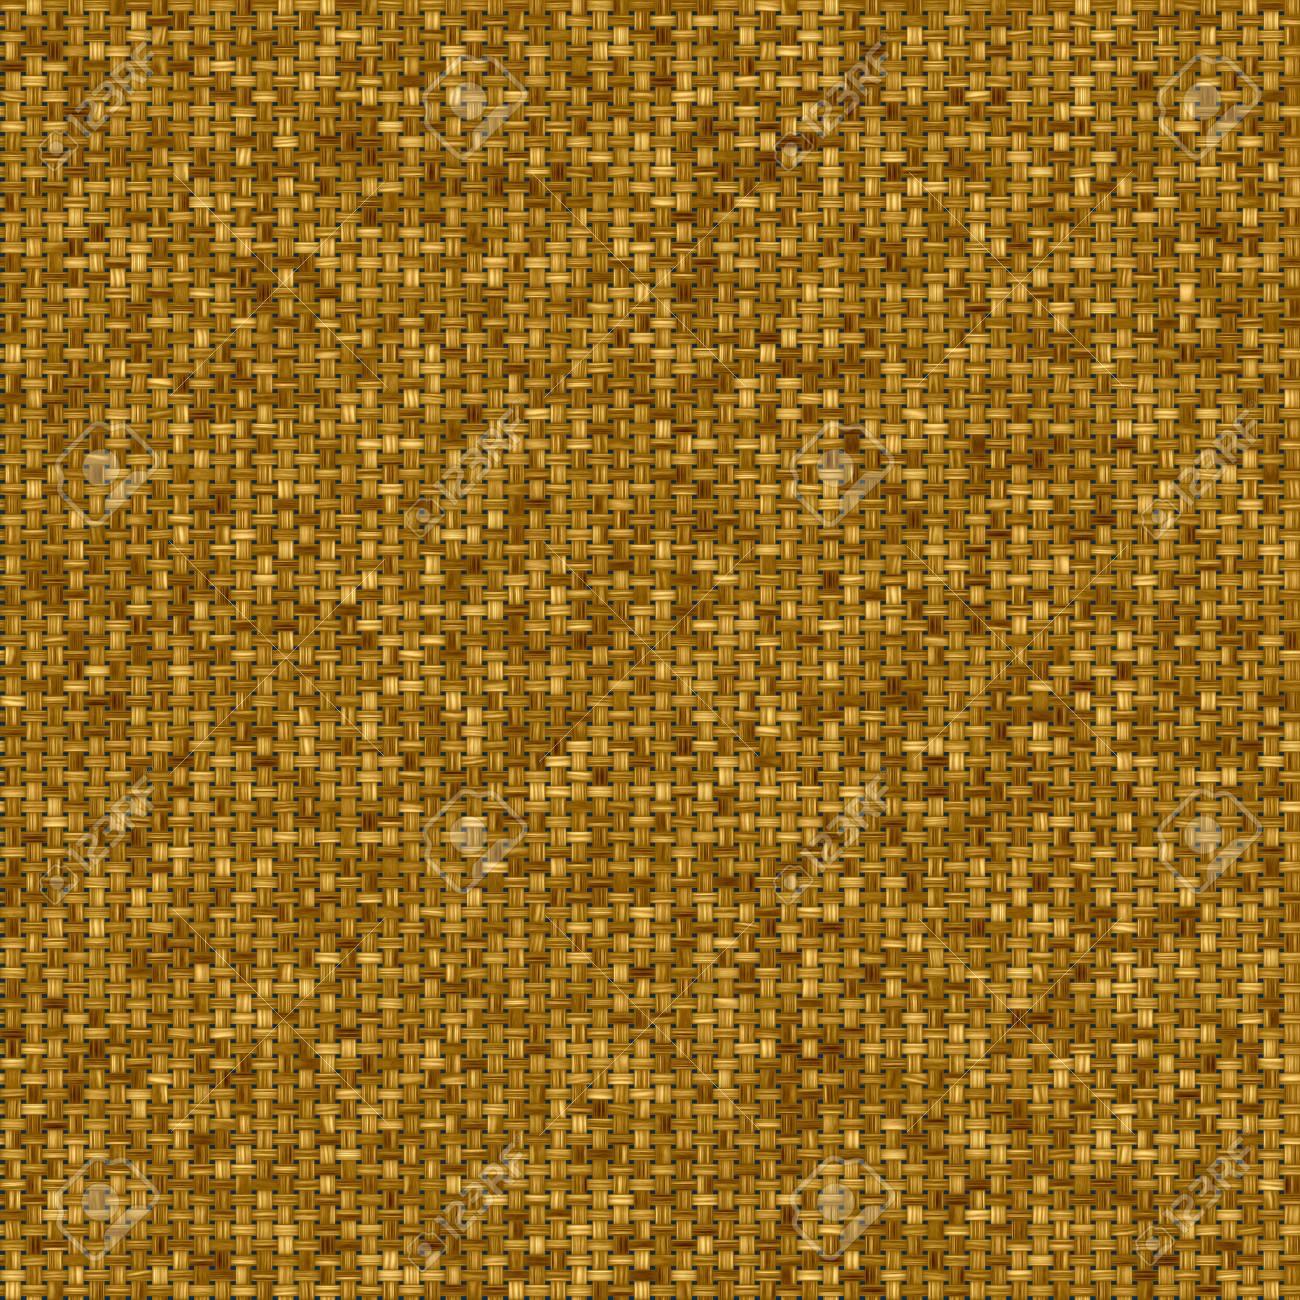 Gold seamless fabric texture pattern